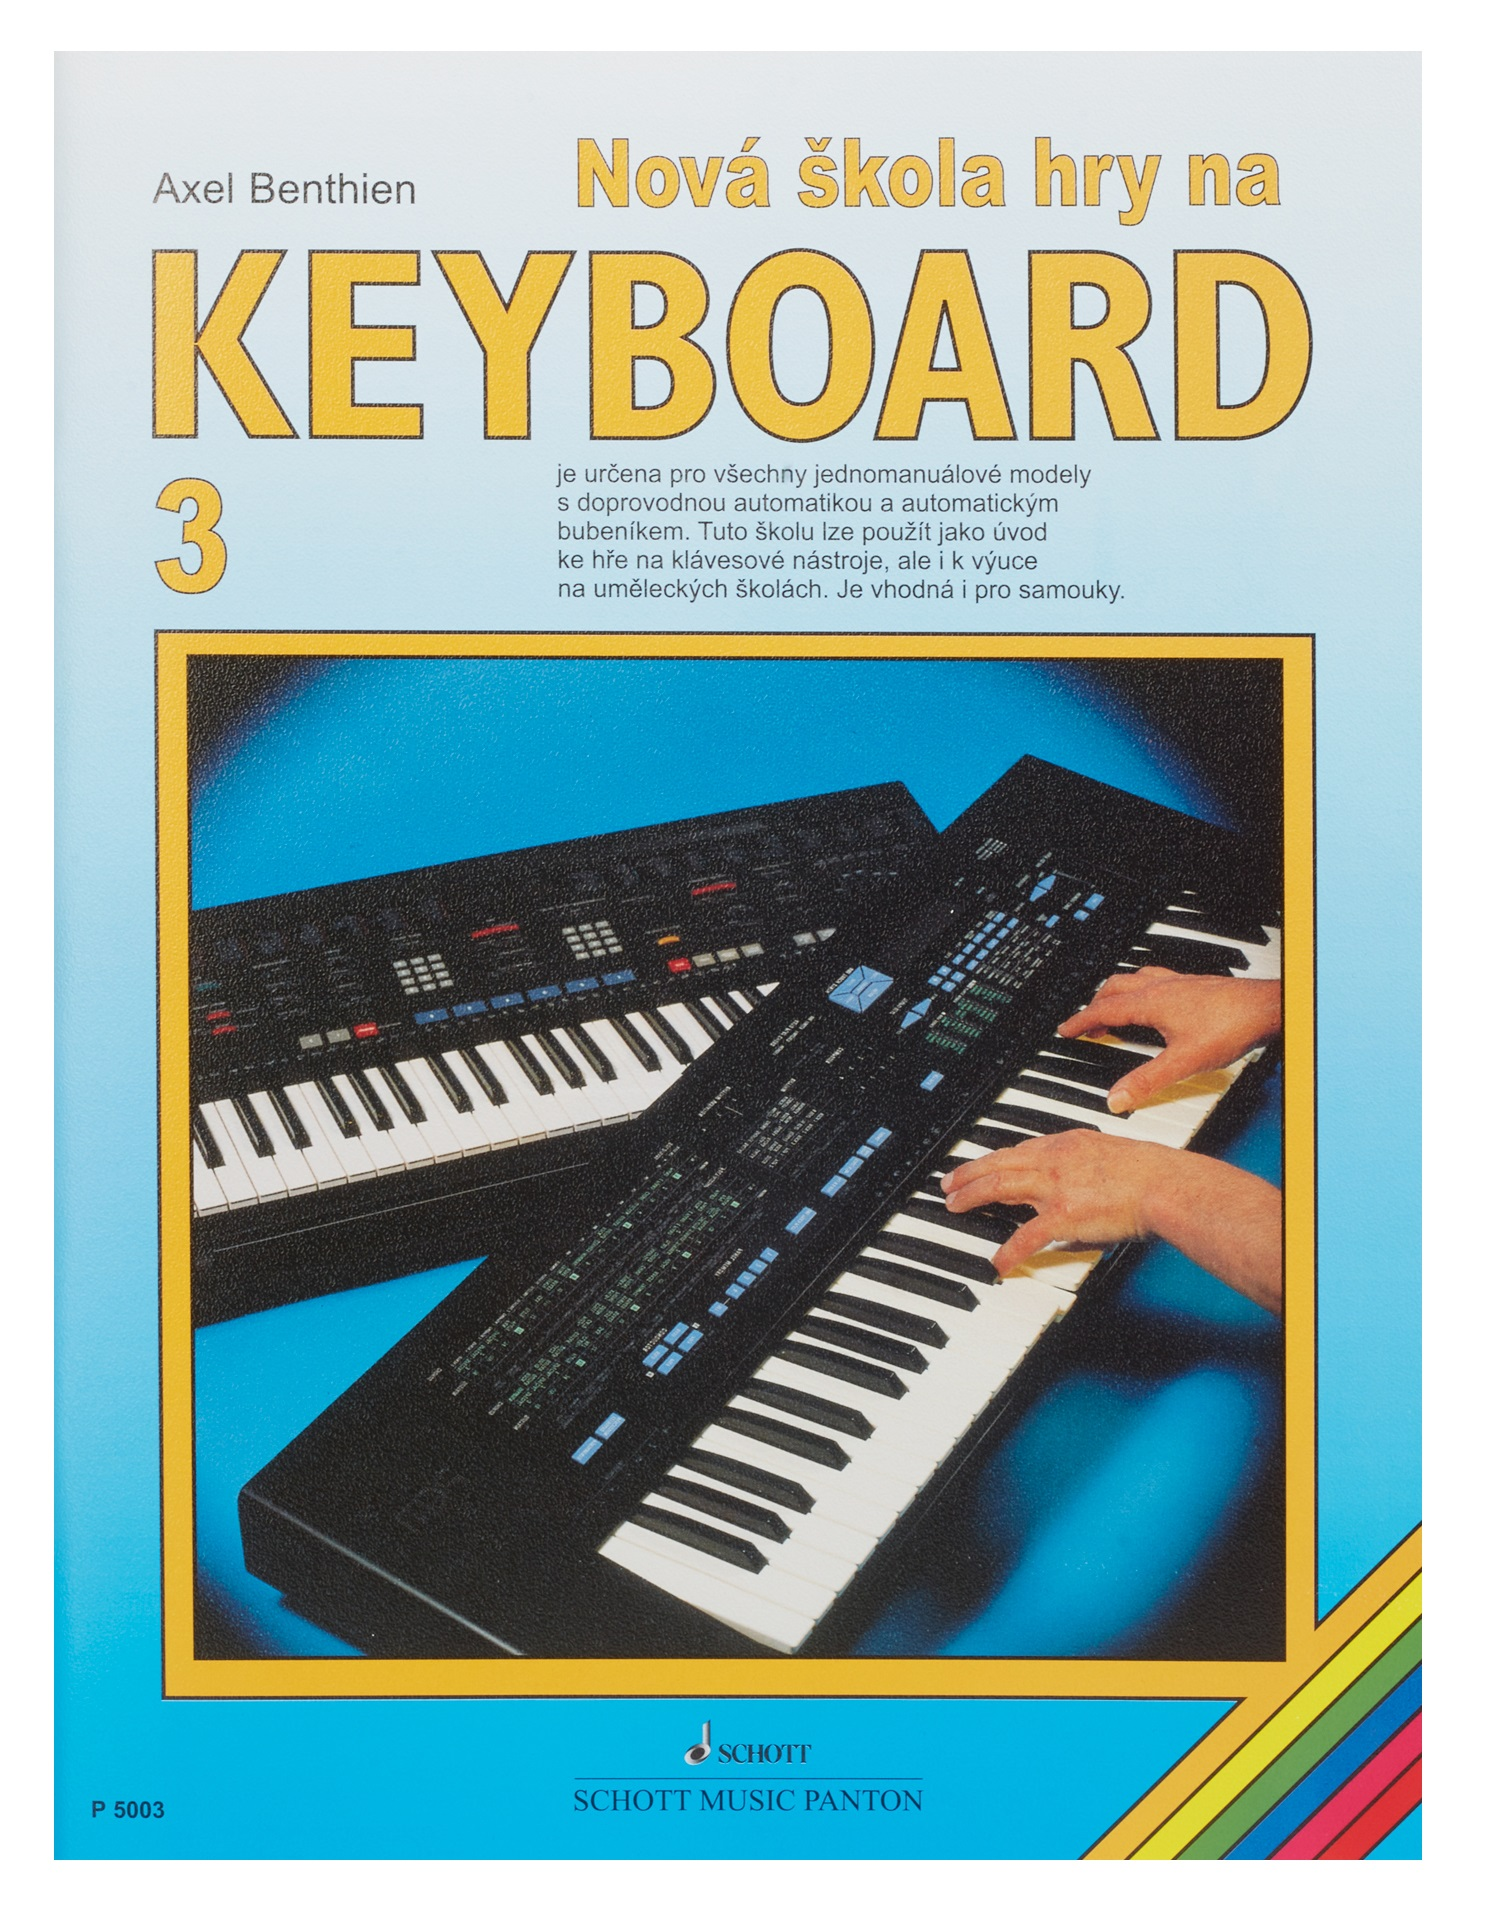 KN Nová škola hry na keyboard III